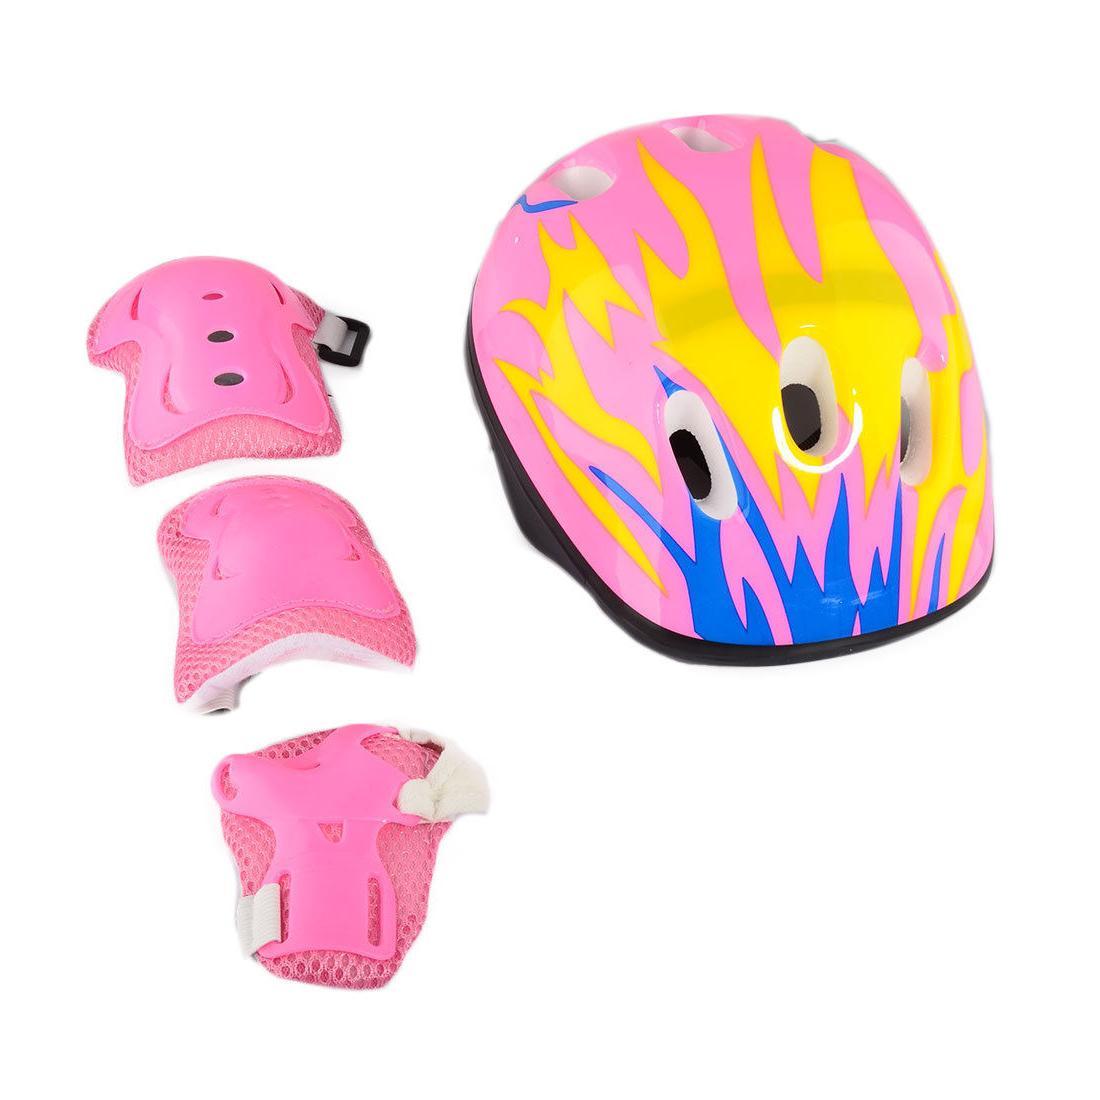 7pcs children kids elbow wrist knee pads